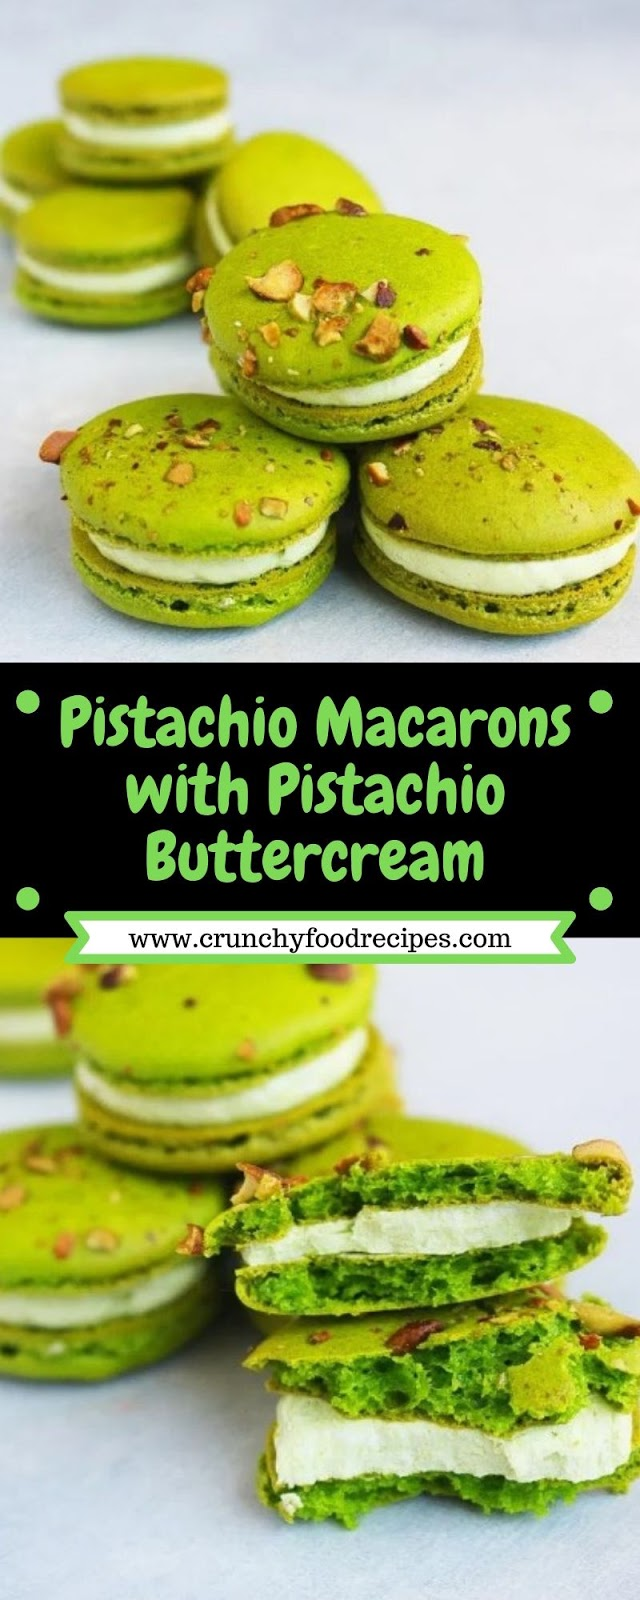 Pistachio Macarons with Pistachio Buttercream